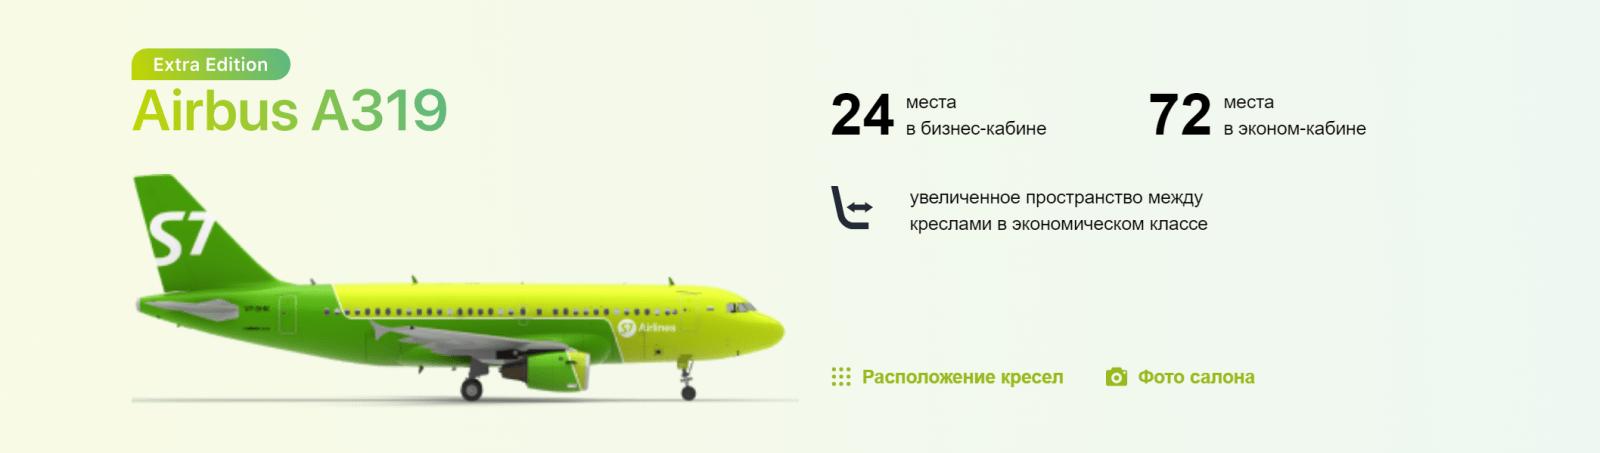 S7 Airlines запустила сервис аренды самолётов (image 3)